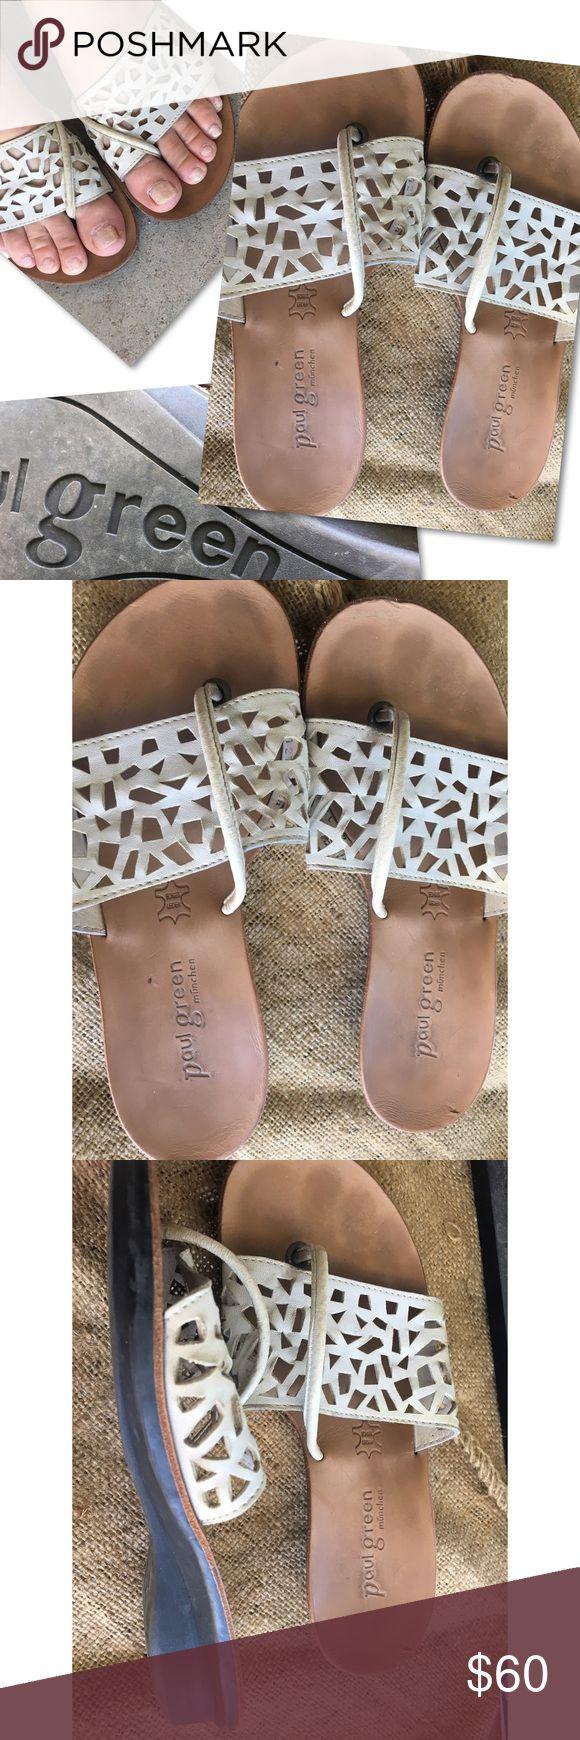 PAUL GREEN WHITE LAZER CUT SHOES SANDALS EURO PAUL GREEN WHITE LAZER CUT SHOES SANDALS EURO SZ 2.5 / US SZ 5 Paul Green Shoes Sandals